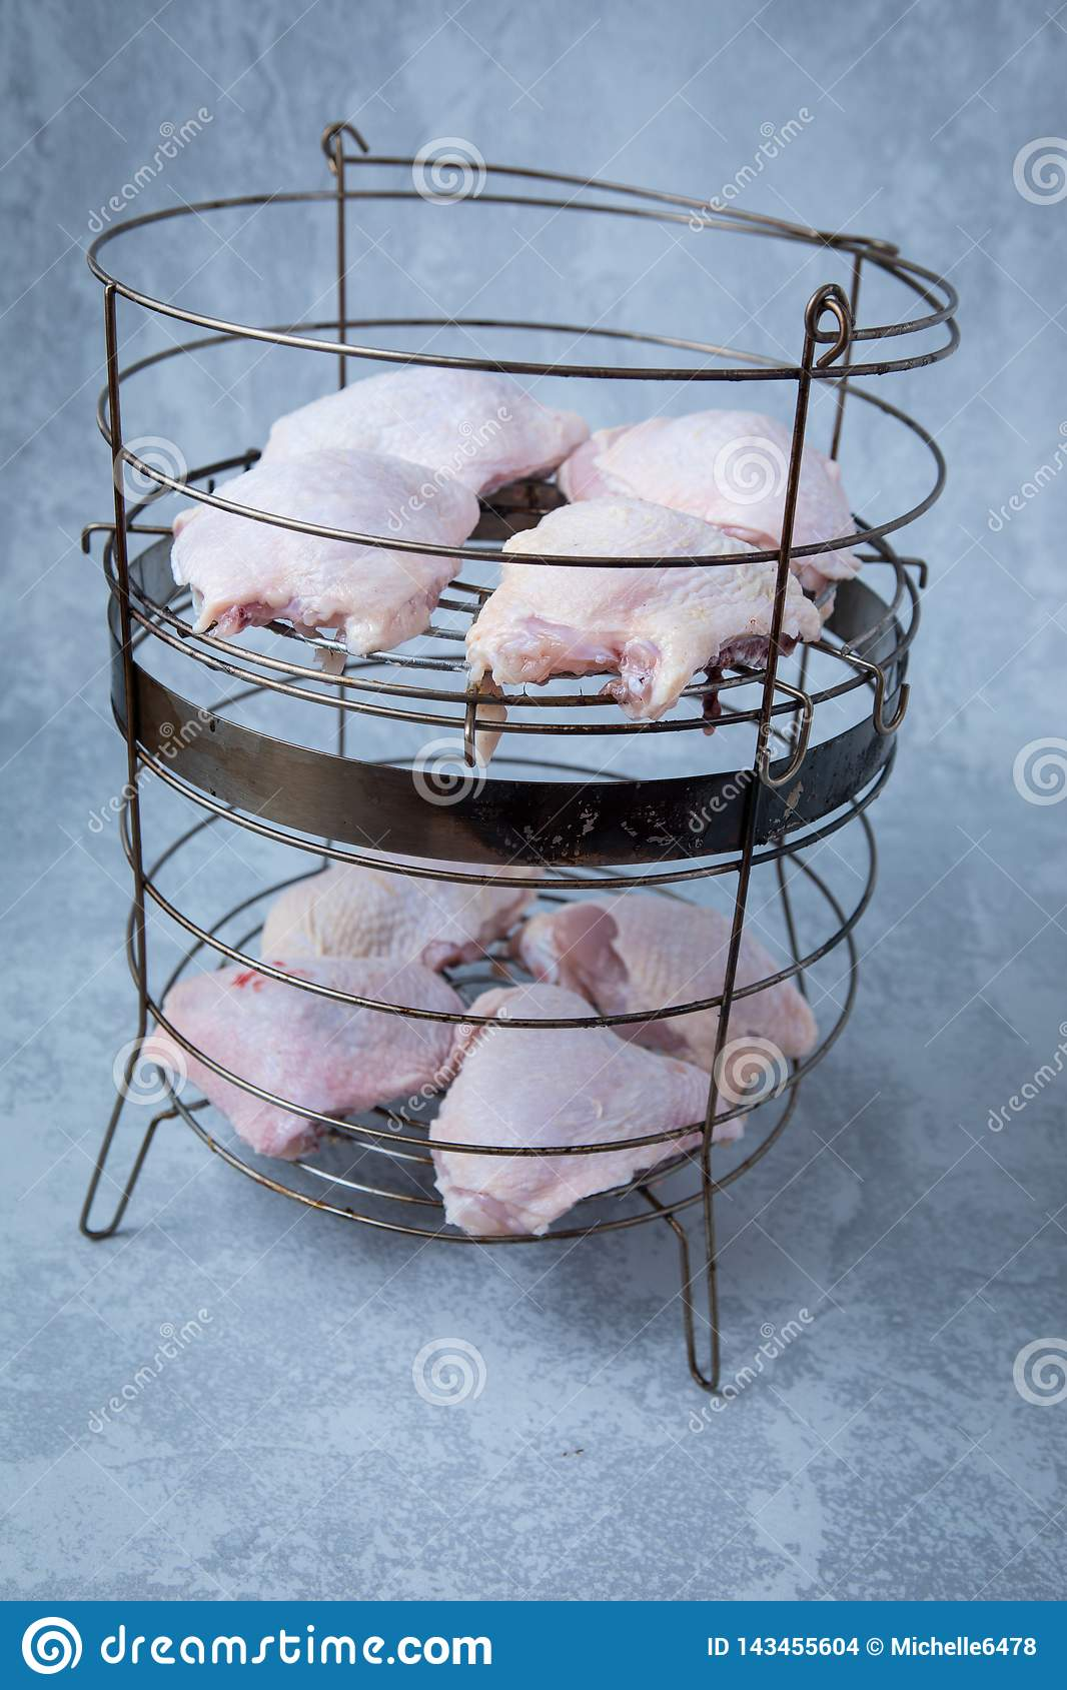 Chicken Smoker Basket